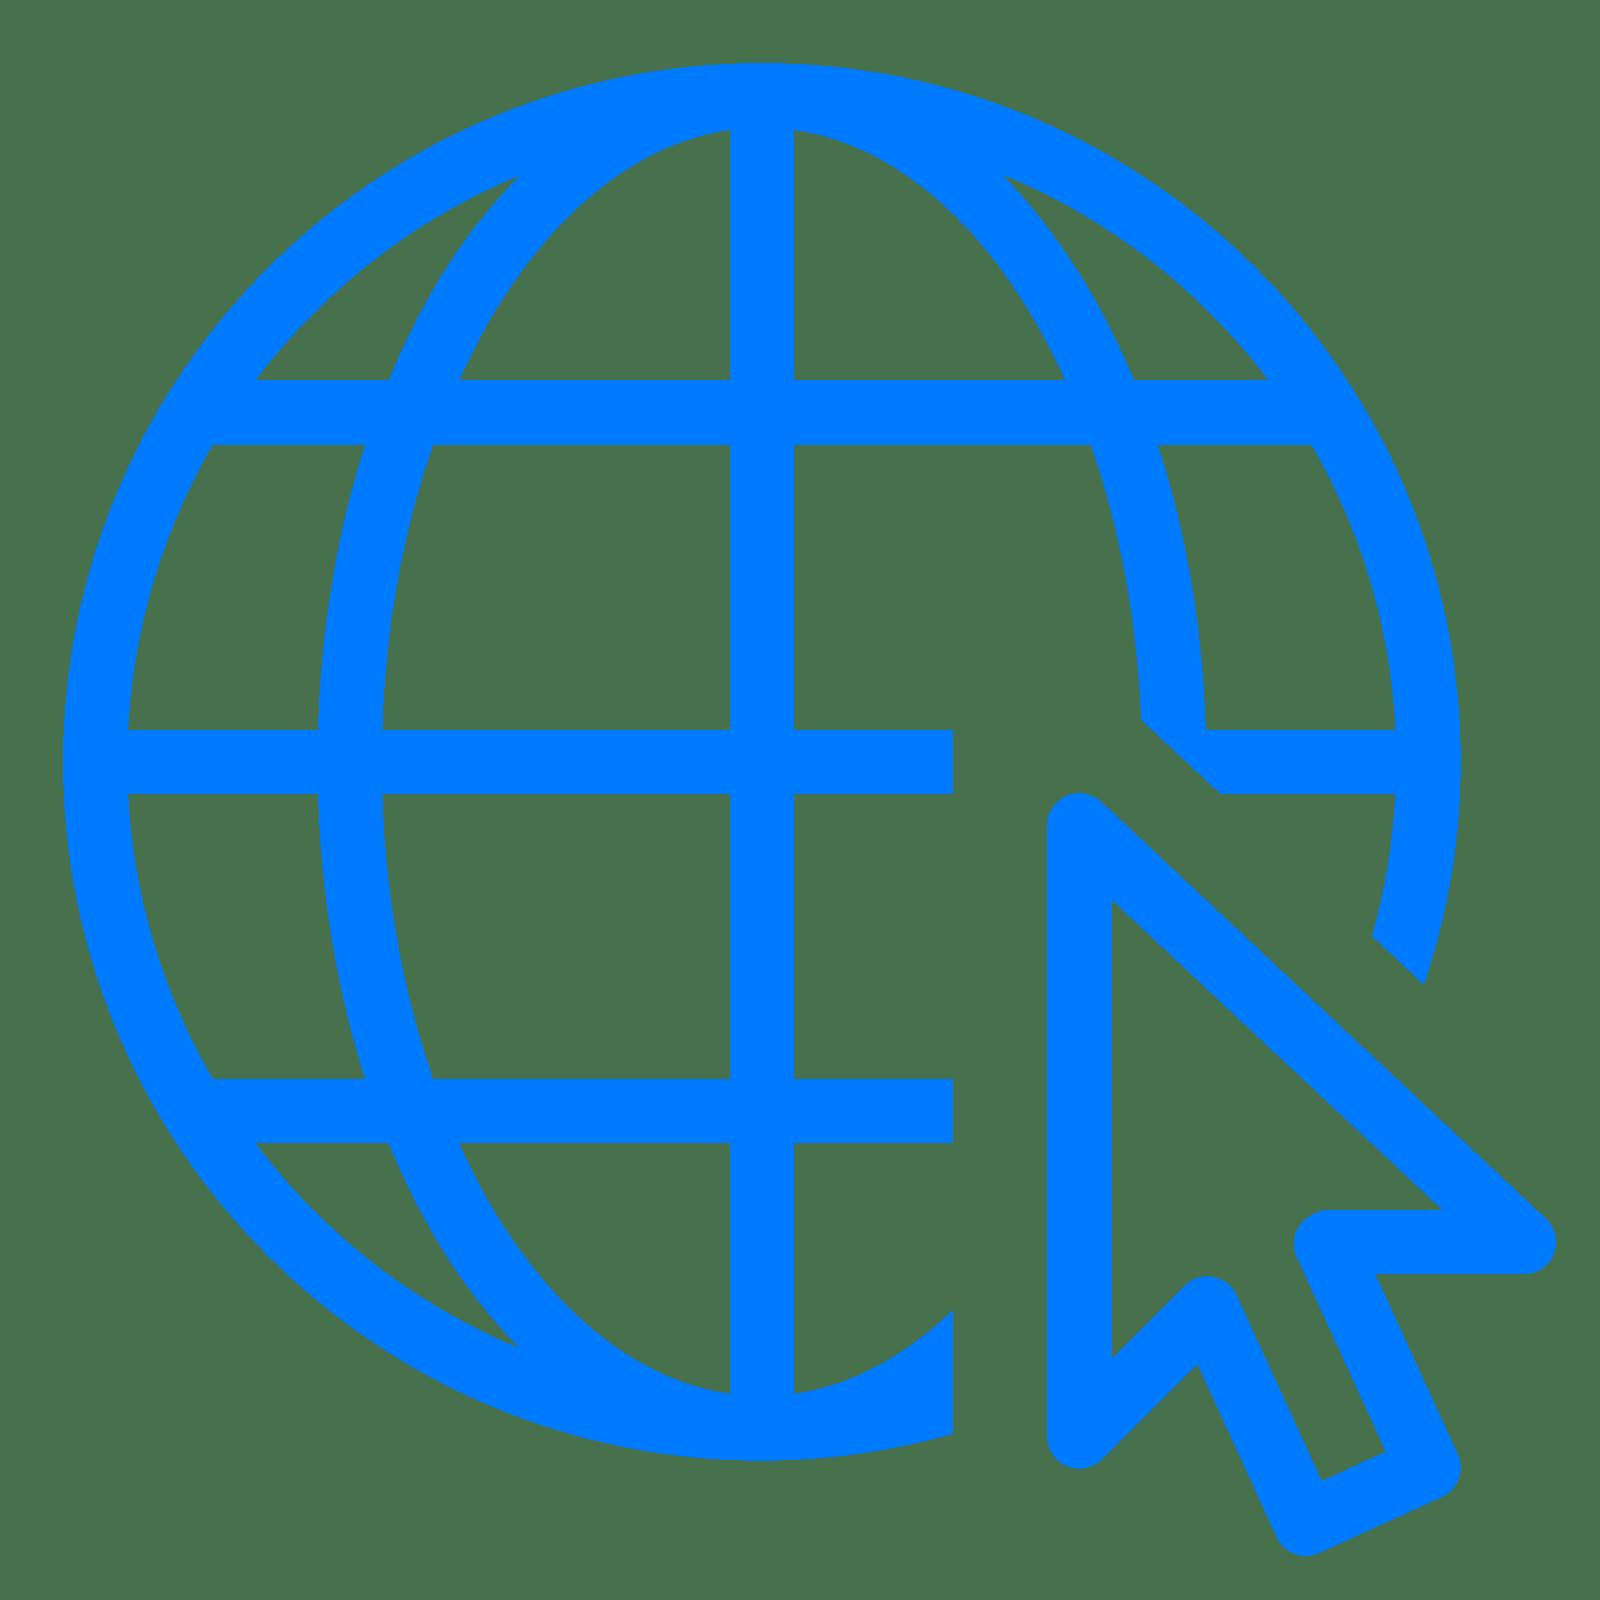 Internet Icon - Internet, Transparent background PNG HD thumbnail